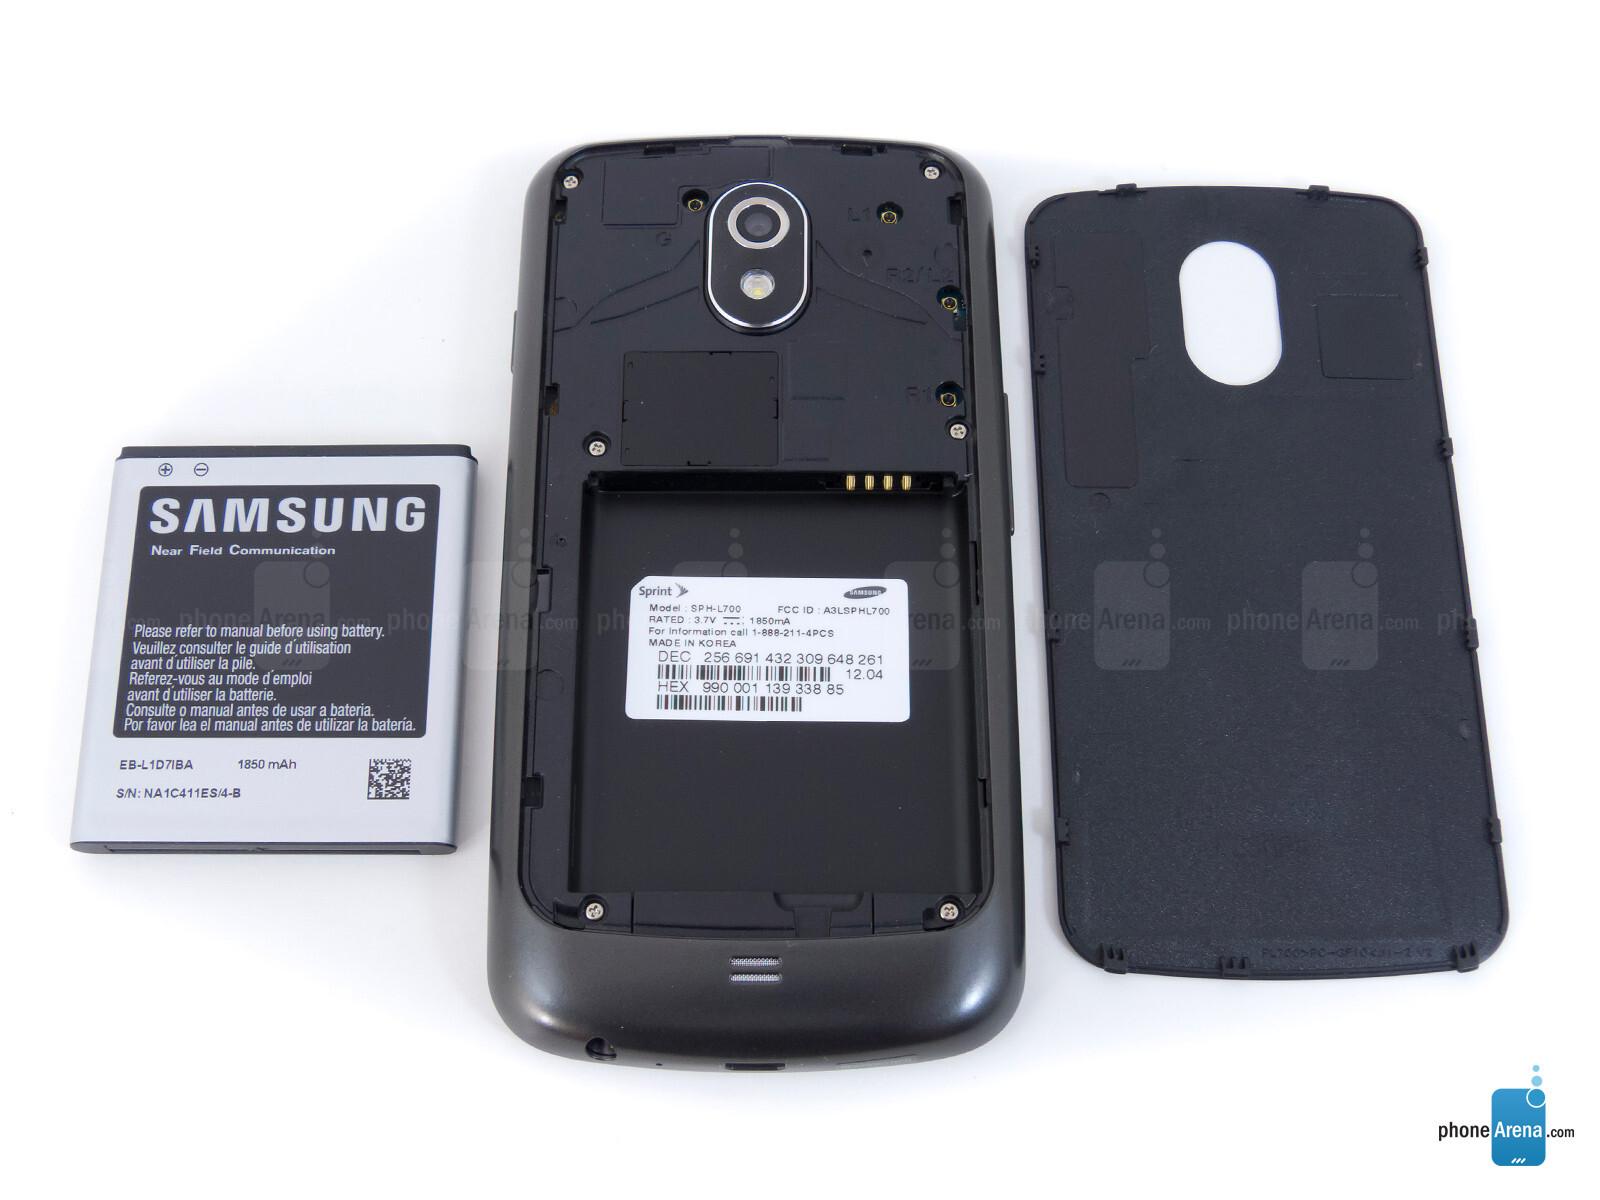 samsung nexus 4g manual today manual guide trends sample u2022 rh brookejasmine co Samsung Galaxy Note ManualDownload Verizon Samsung Flip Cell Phone